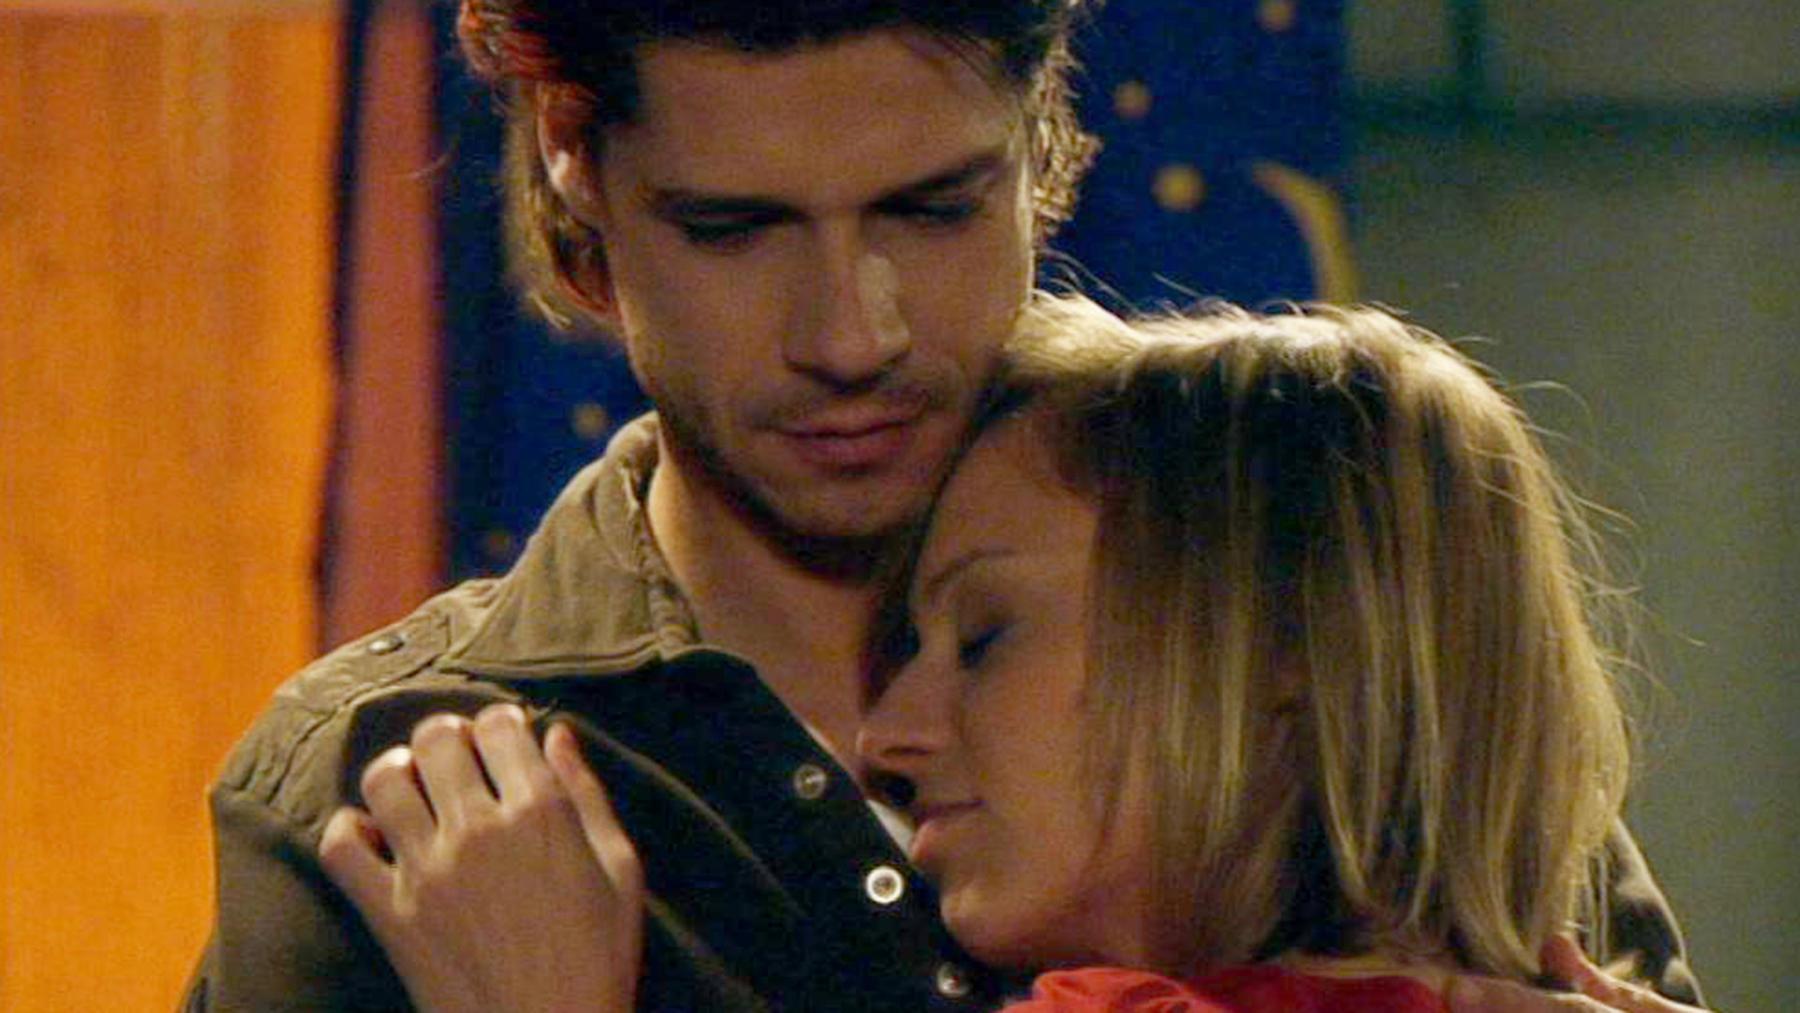 Simone entdeckt an Richard völlig neue Seiten.